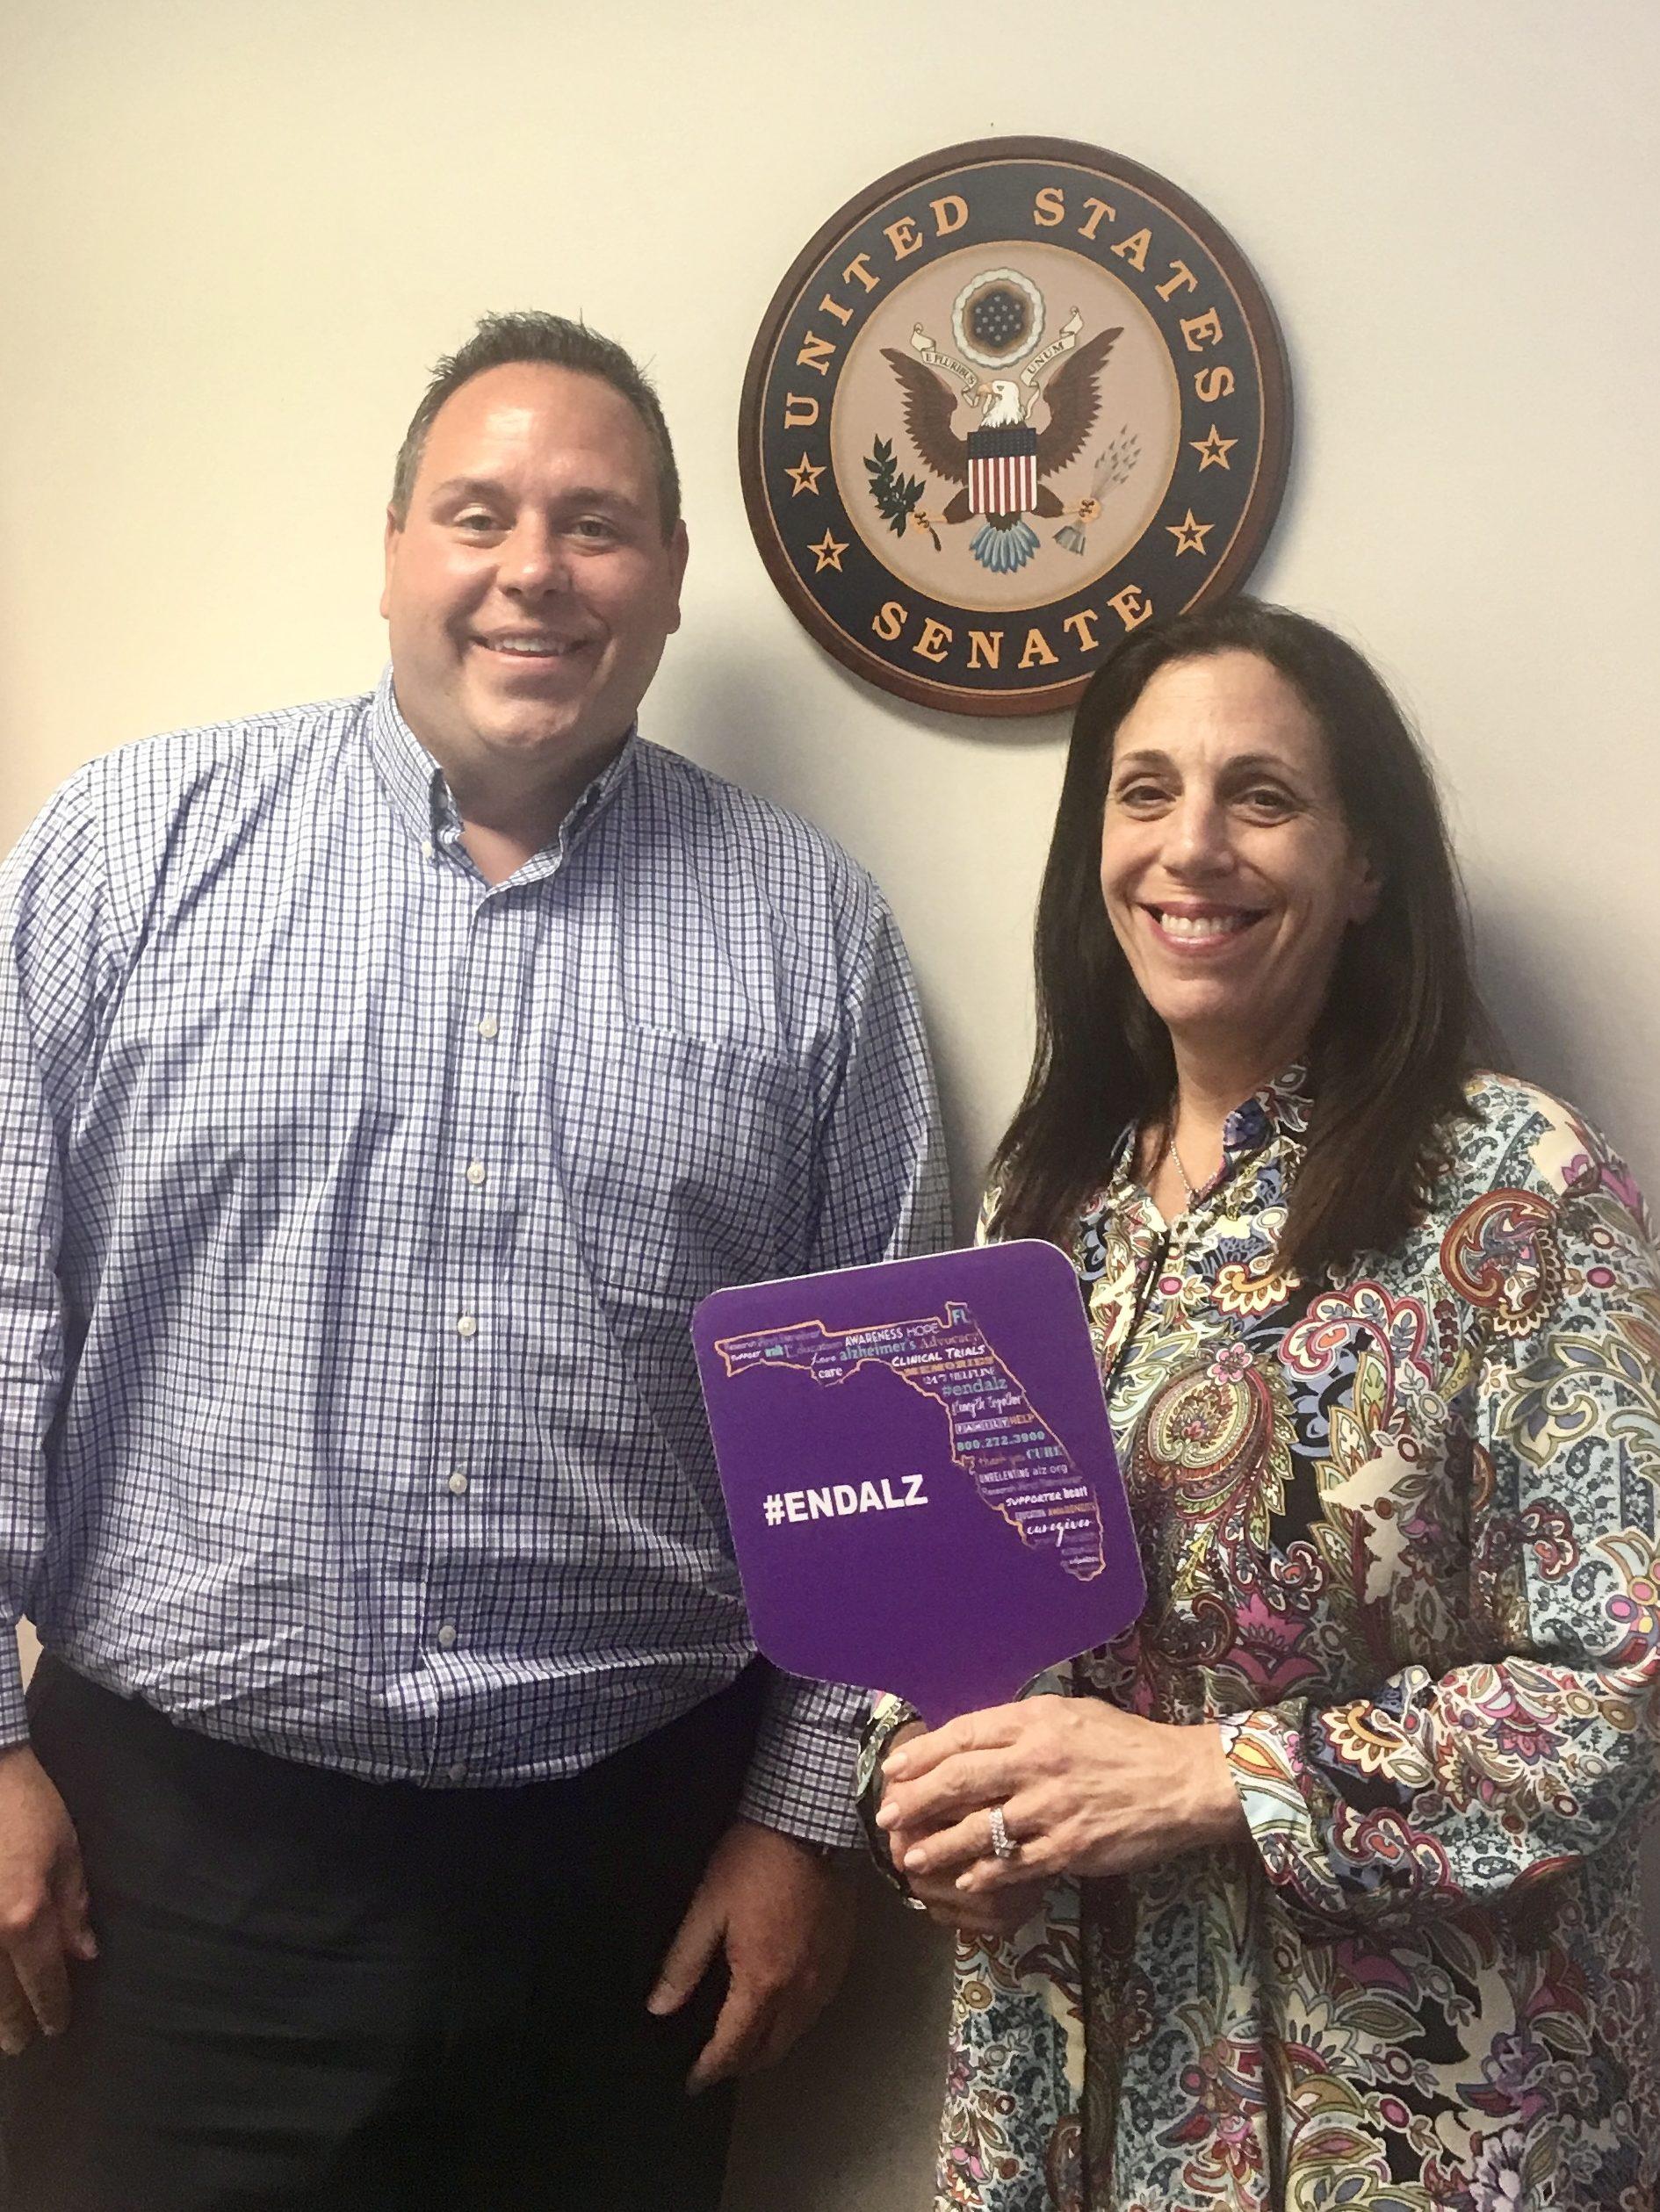 Alzheimer's Association Ambassador Nancy Ginden with Greg Langowski, regional director for Senator Marco Rubio, at the Senator's office in Palm Beach Gardens.